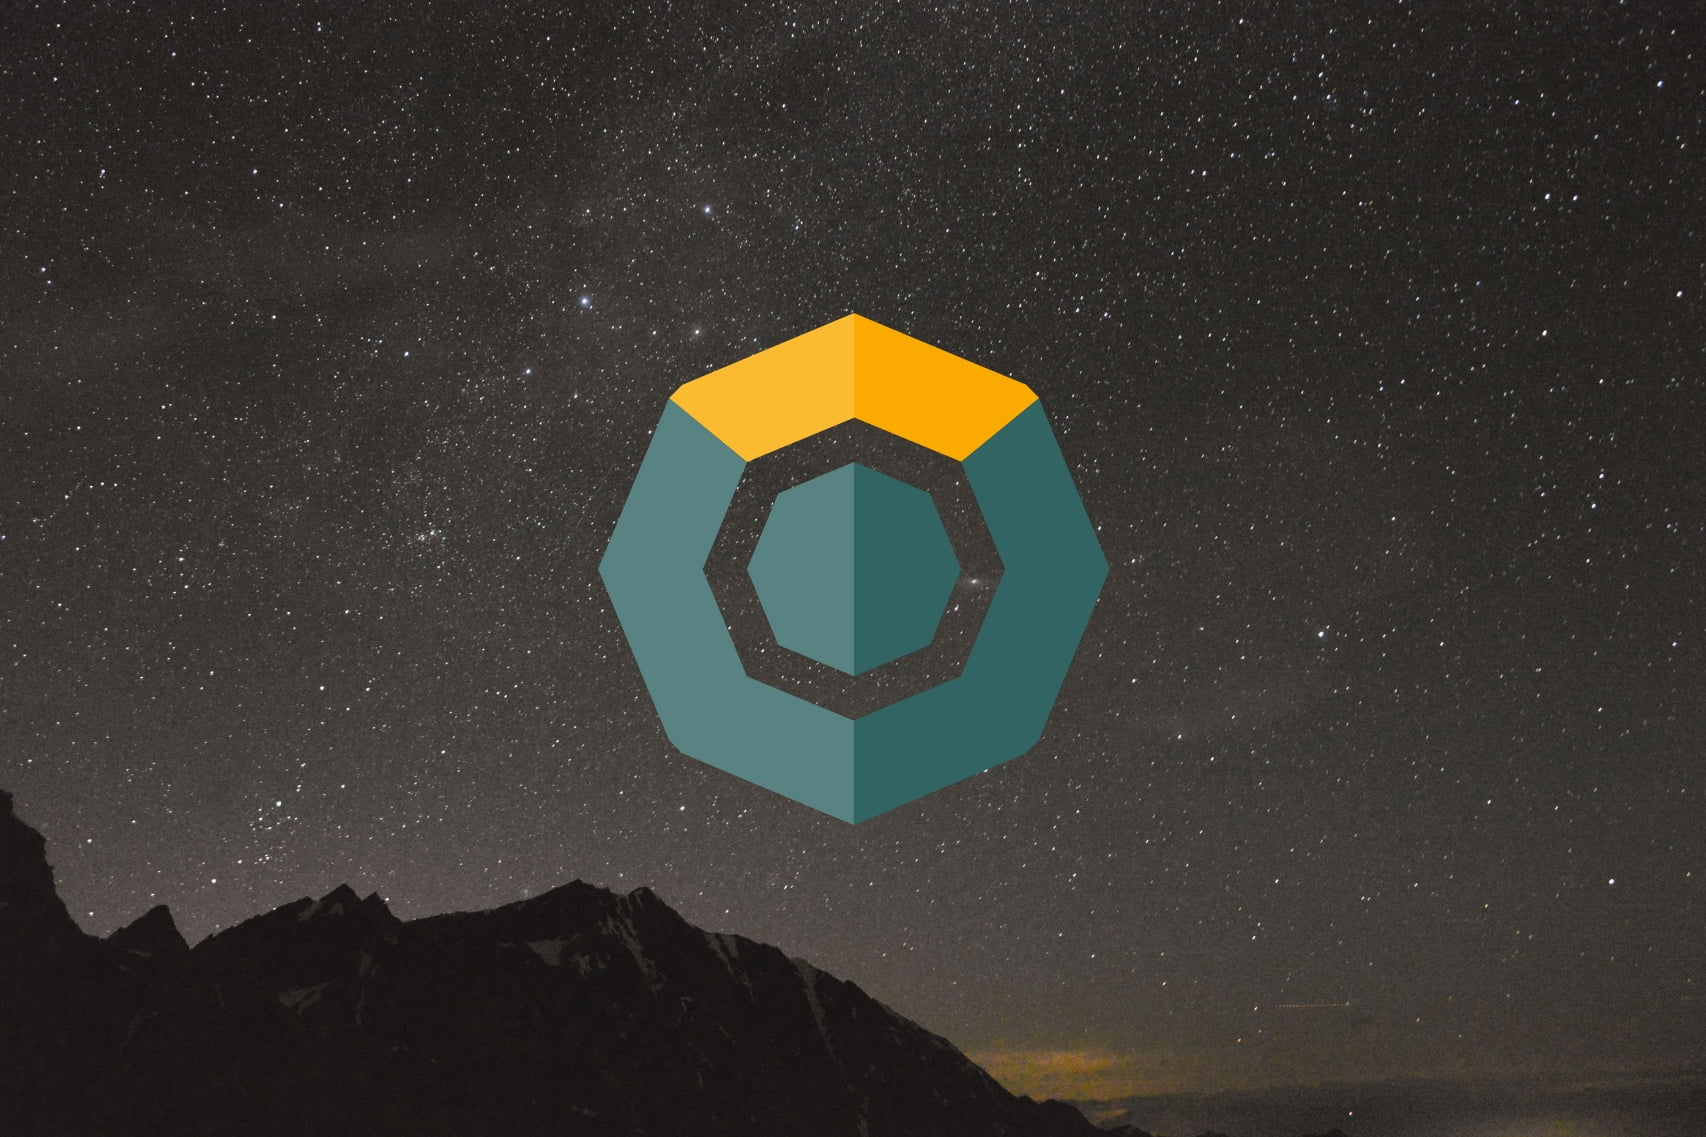 Komodo_Block_One_Million